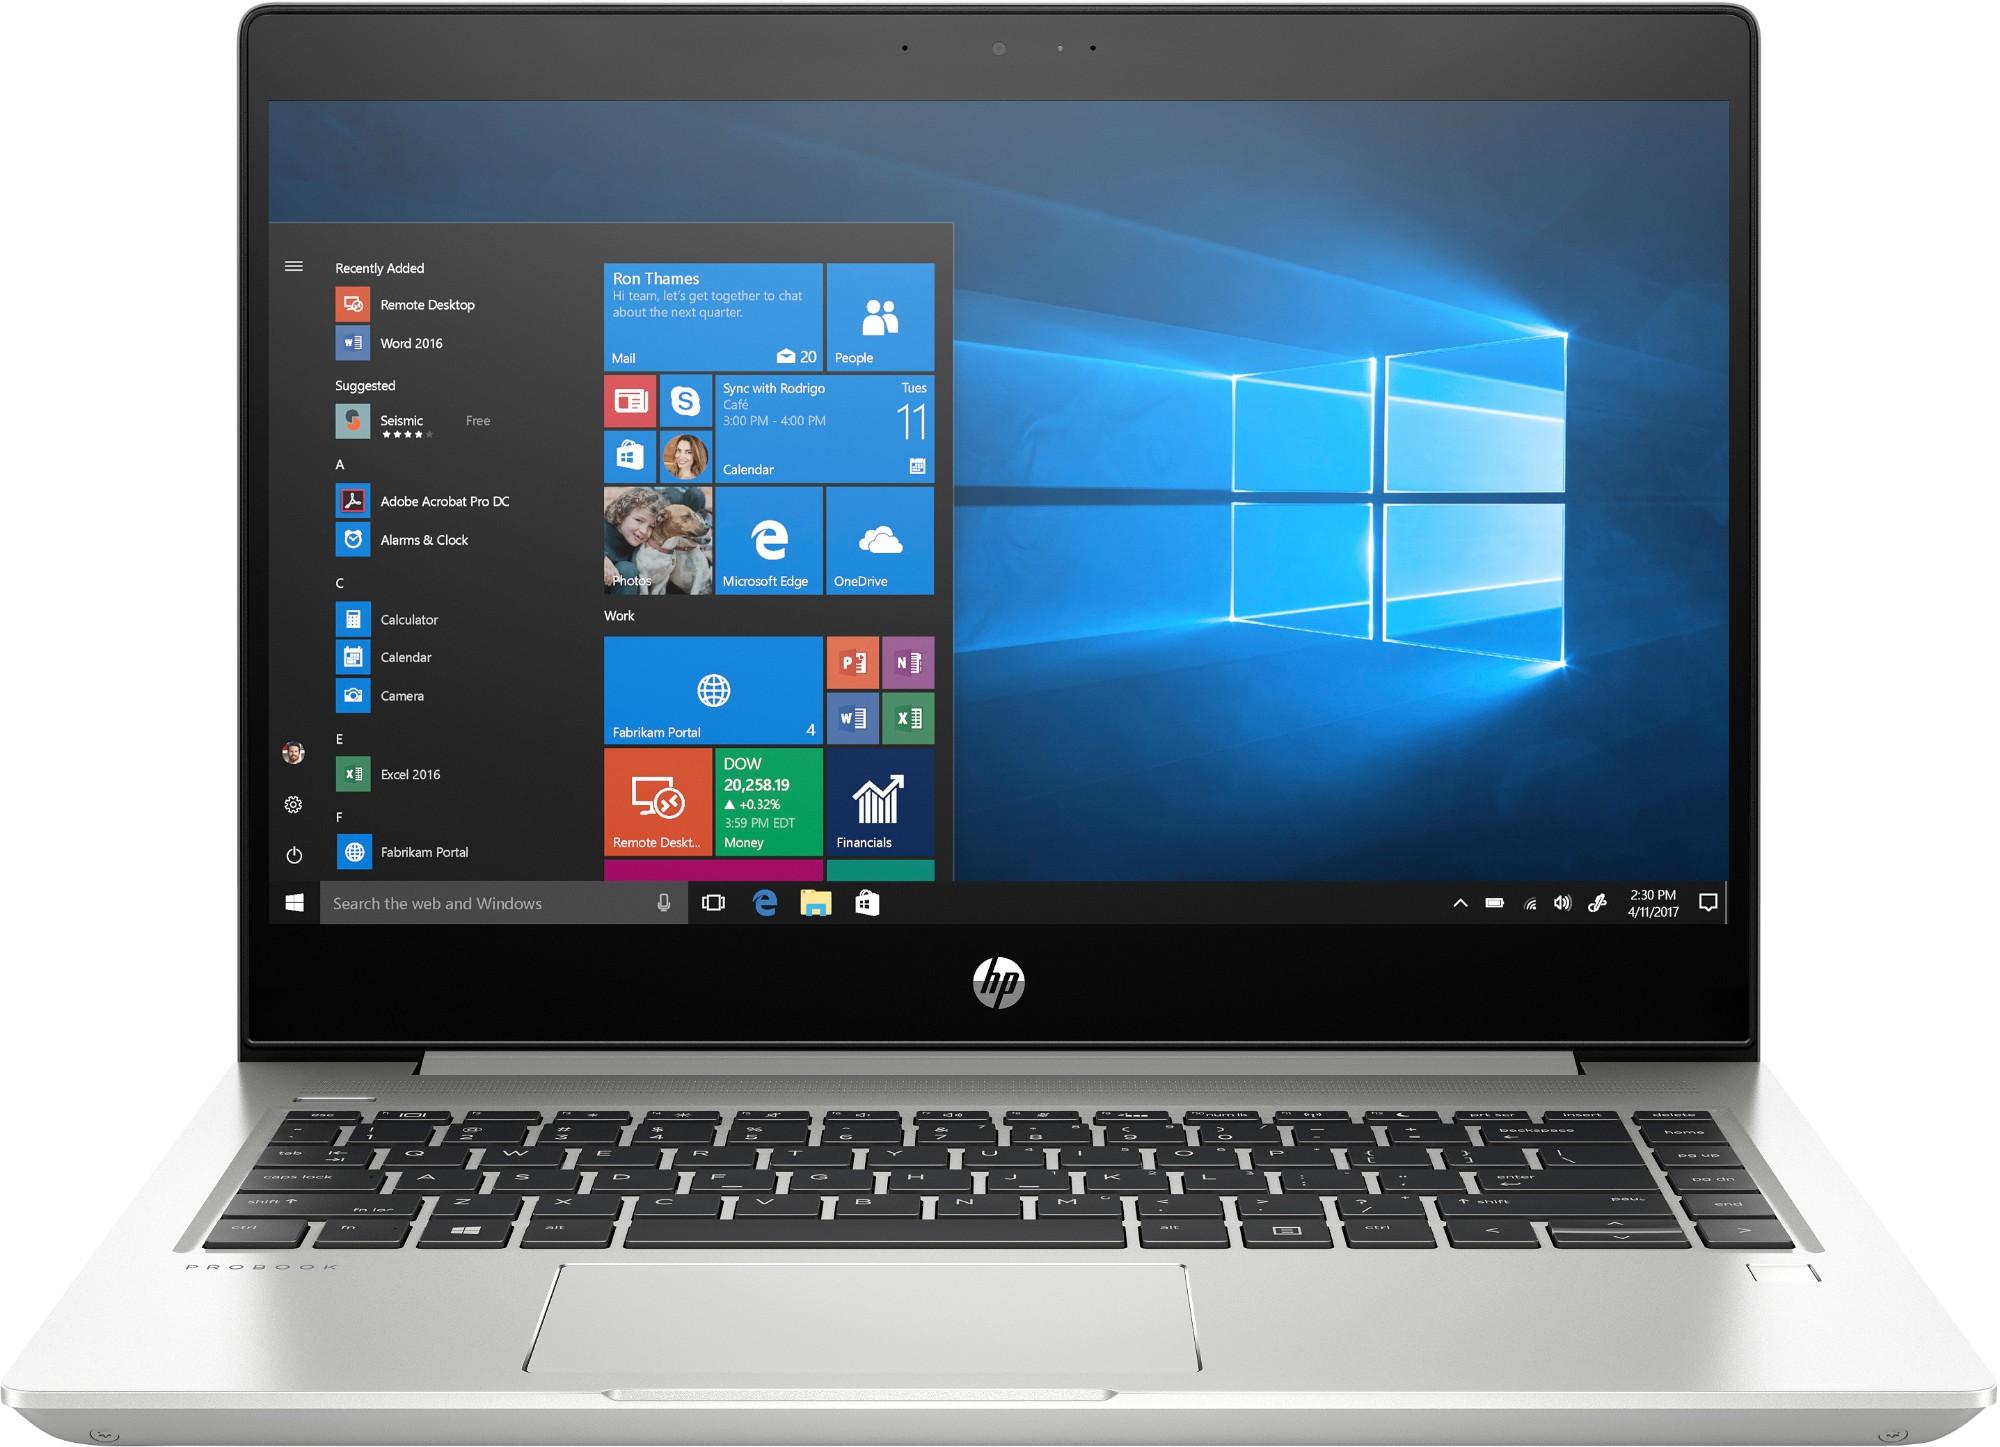 HP ProBook 445R G6 Silver Notebook 35.6 cm (14